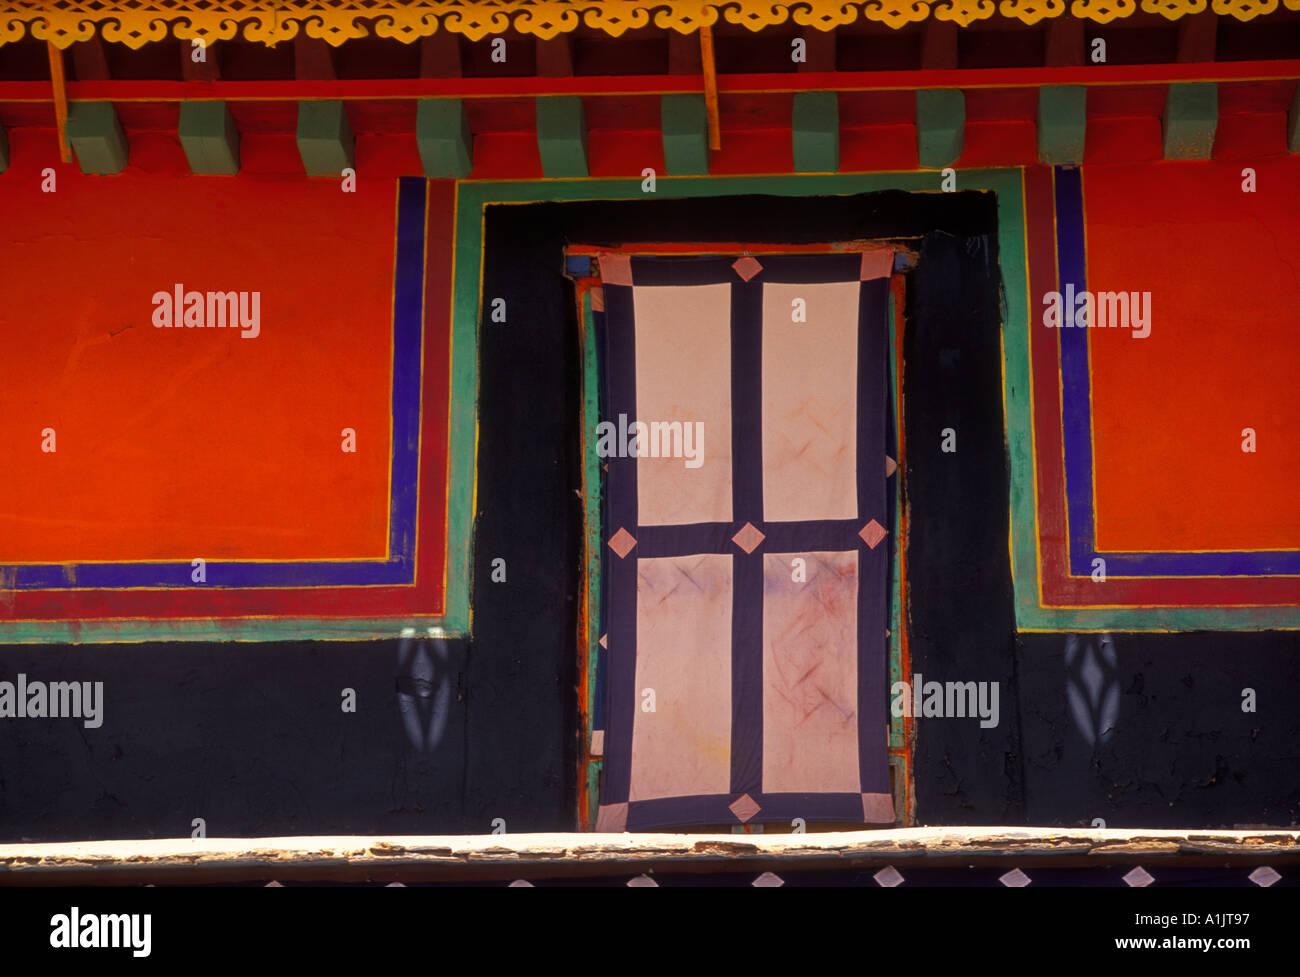 wall along, corridor, courtyard, patio, The Potala Palace, Potala Palace, city of Lhasa, Lhasa, Tibet, China, Asia - Stock Image